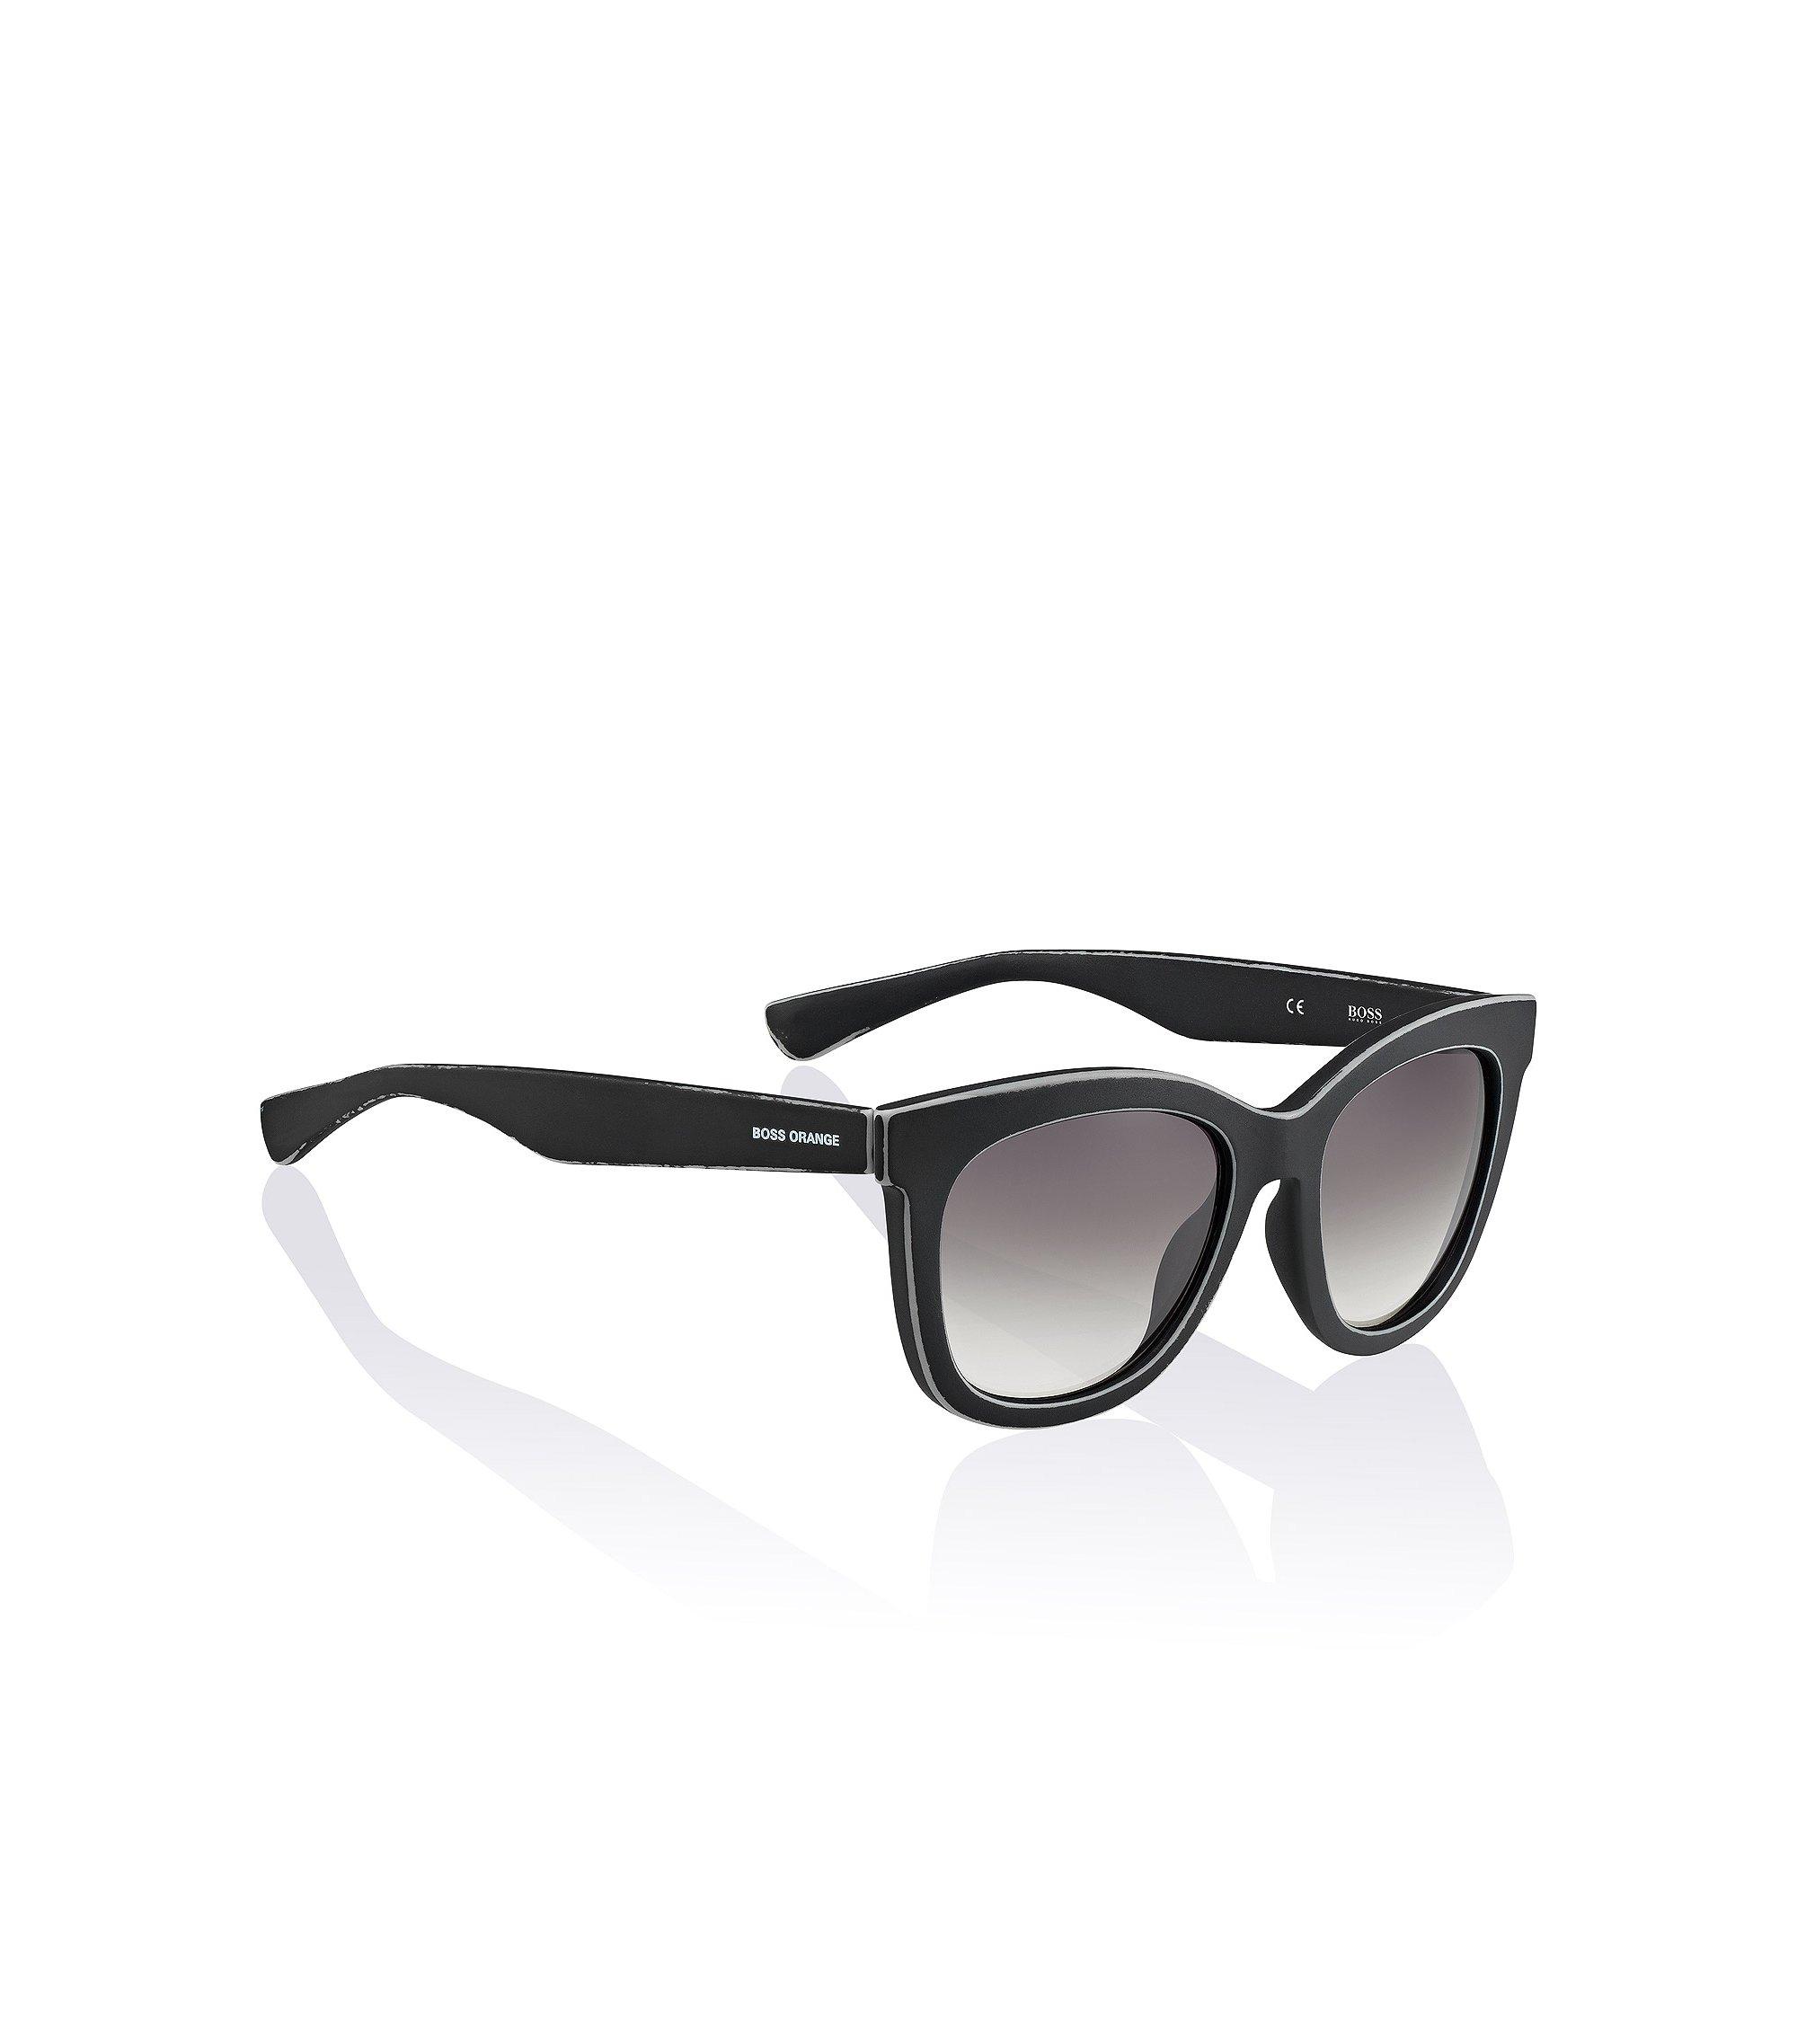 Wayfarer-Sonnenbrille ´BO 0199` aus Acetat, Assorted-Pre-Pack